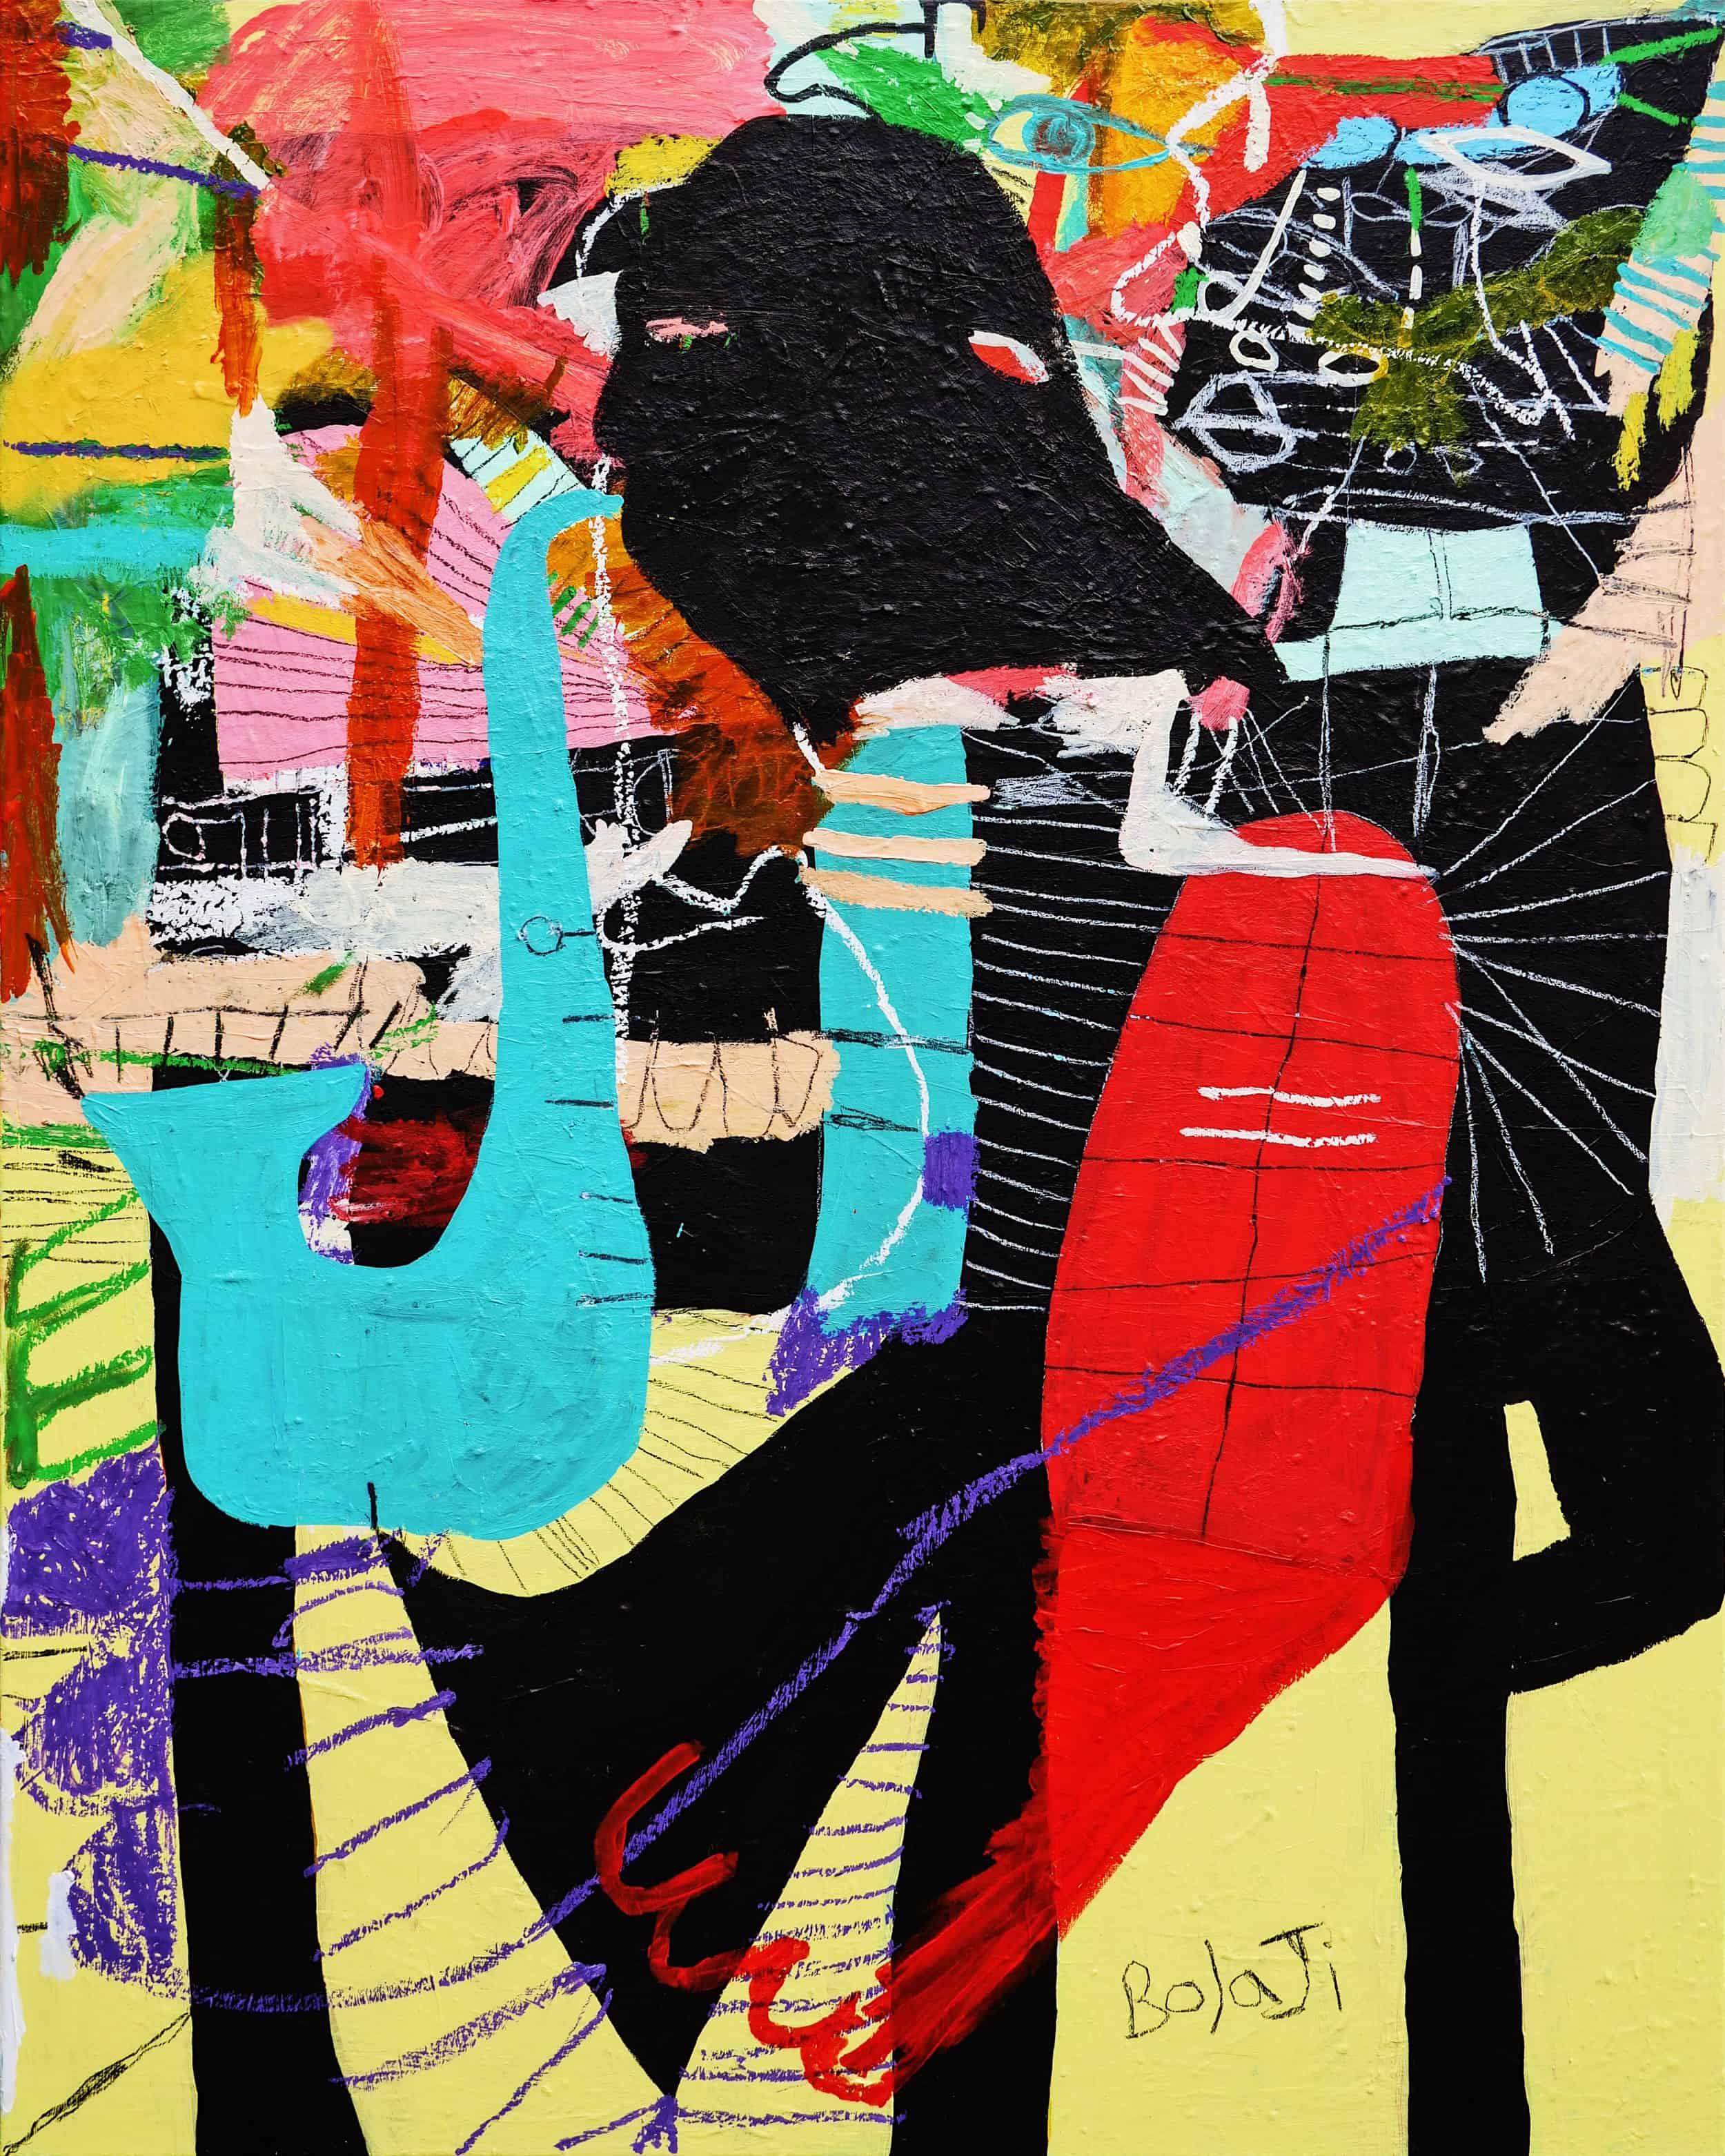 Saint Coltrane (2020), acrylic, crayon, spray paint aand oil pastel on cotton canvas, 124x154cm